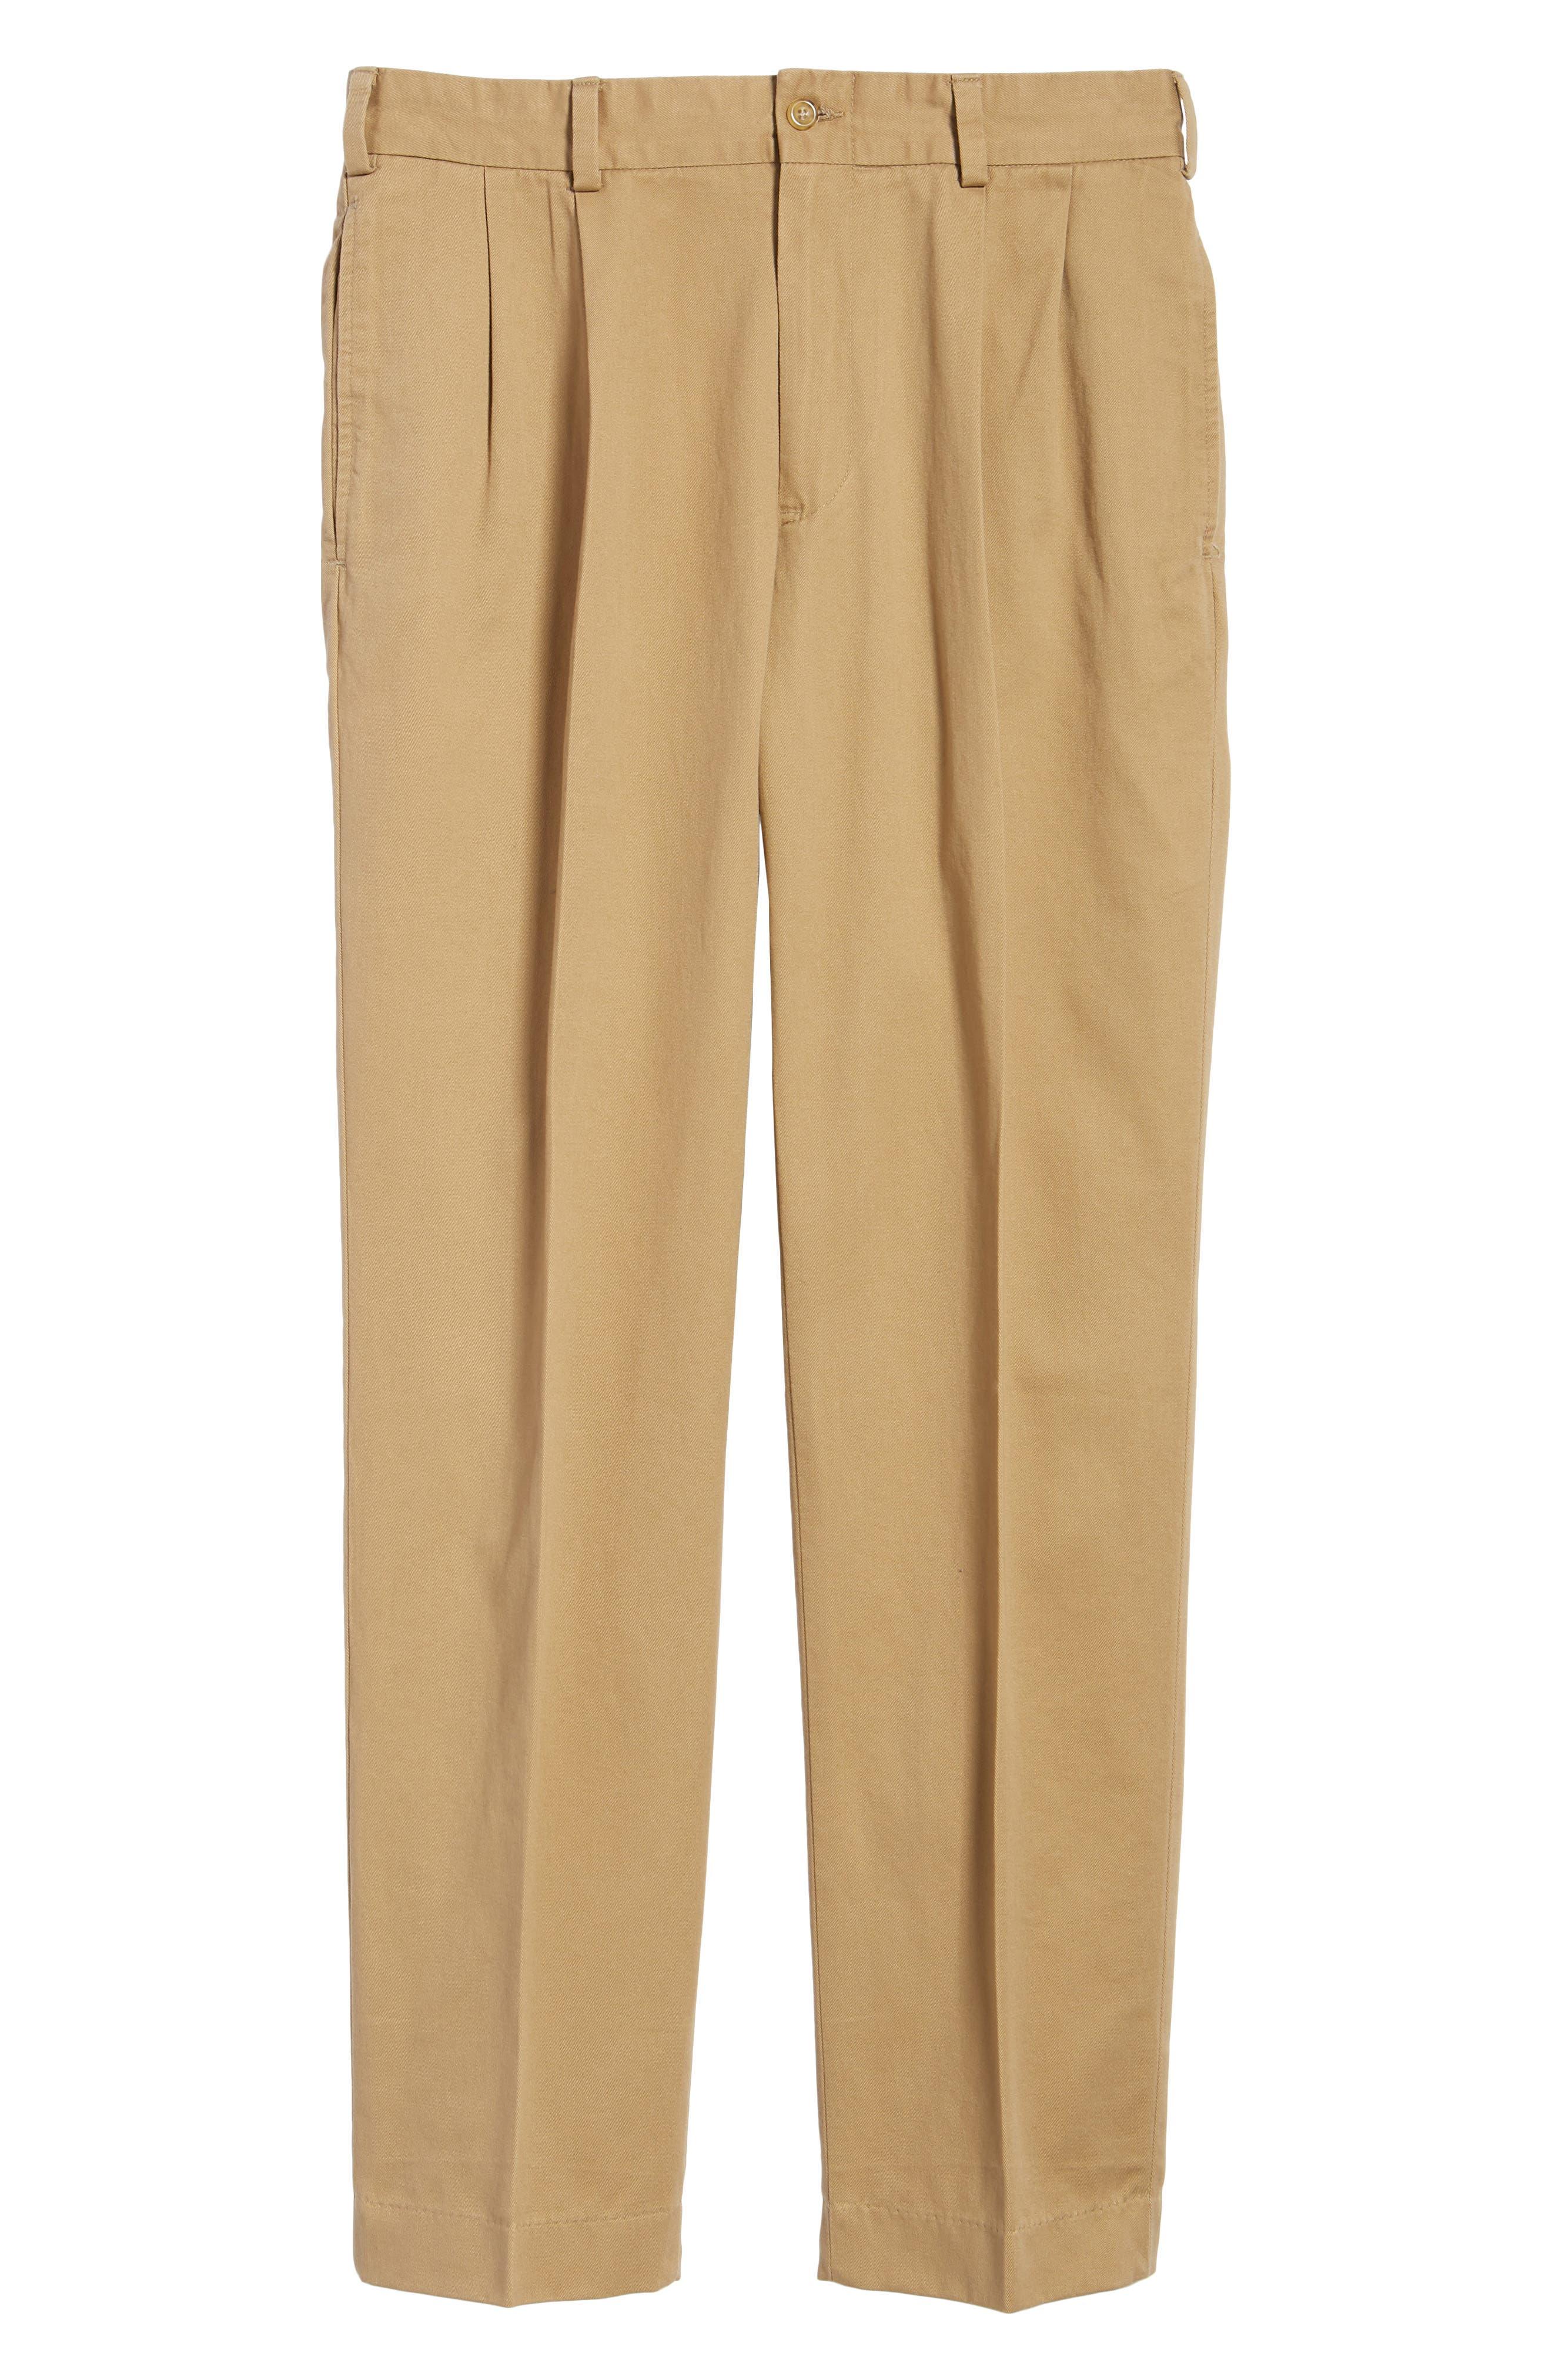 M2 Classic Fit Pleated Vintage Twill Pants,                             Alternate thumbnail 6, color,                             BRITISH KHAKI